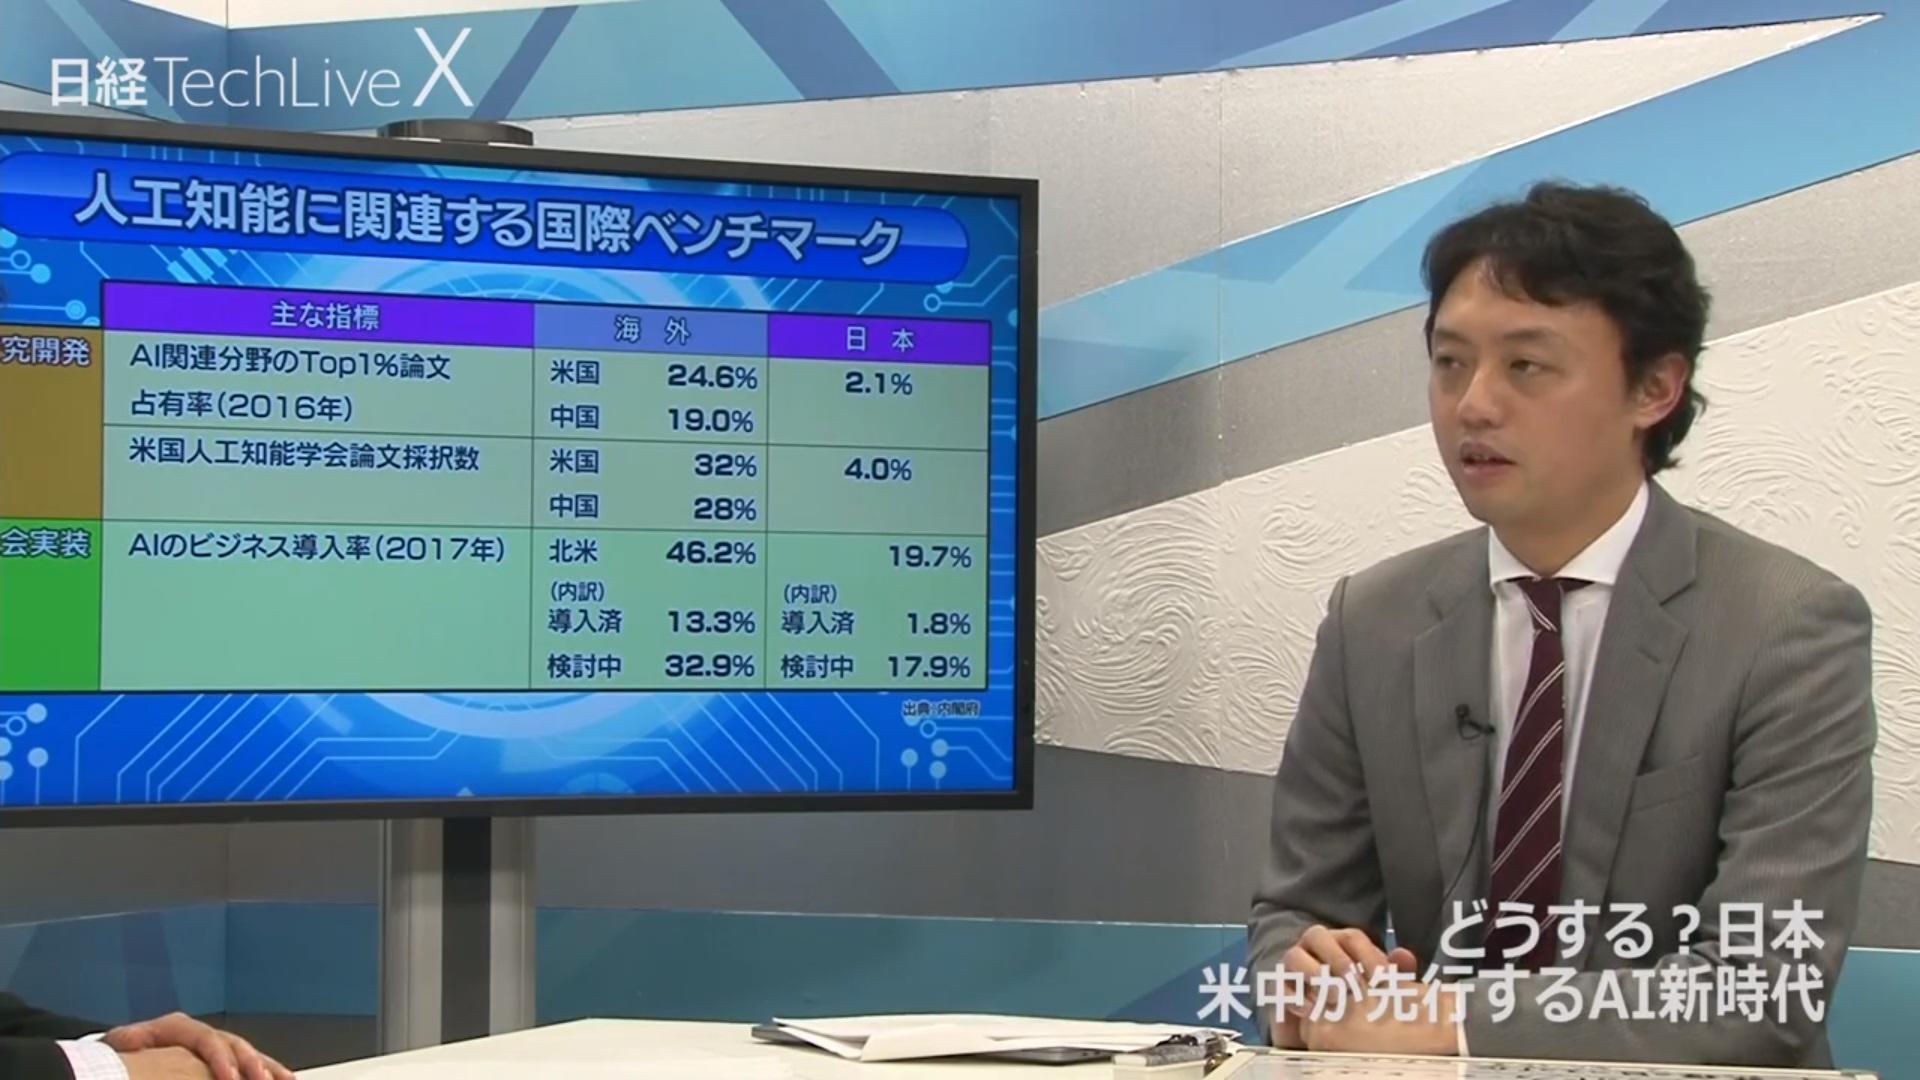 AIウォーズ ニッポン復活の未来戦略~グーグル、FBに勝つ秘策~(第3回):日本逆転の秘策